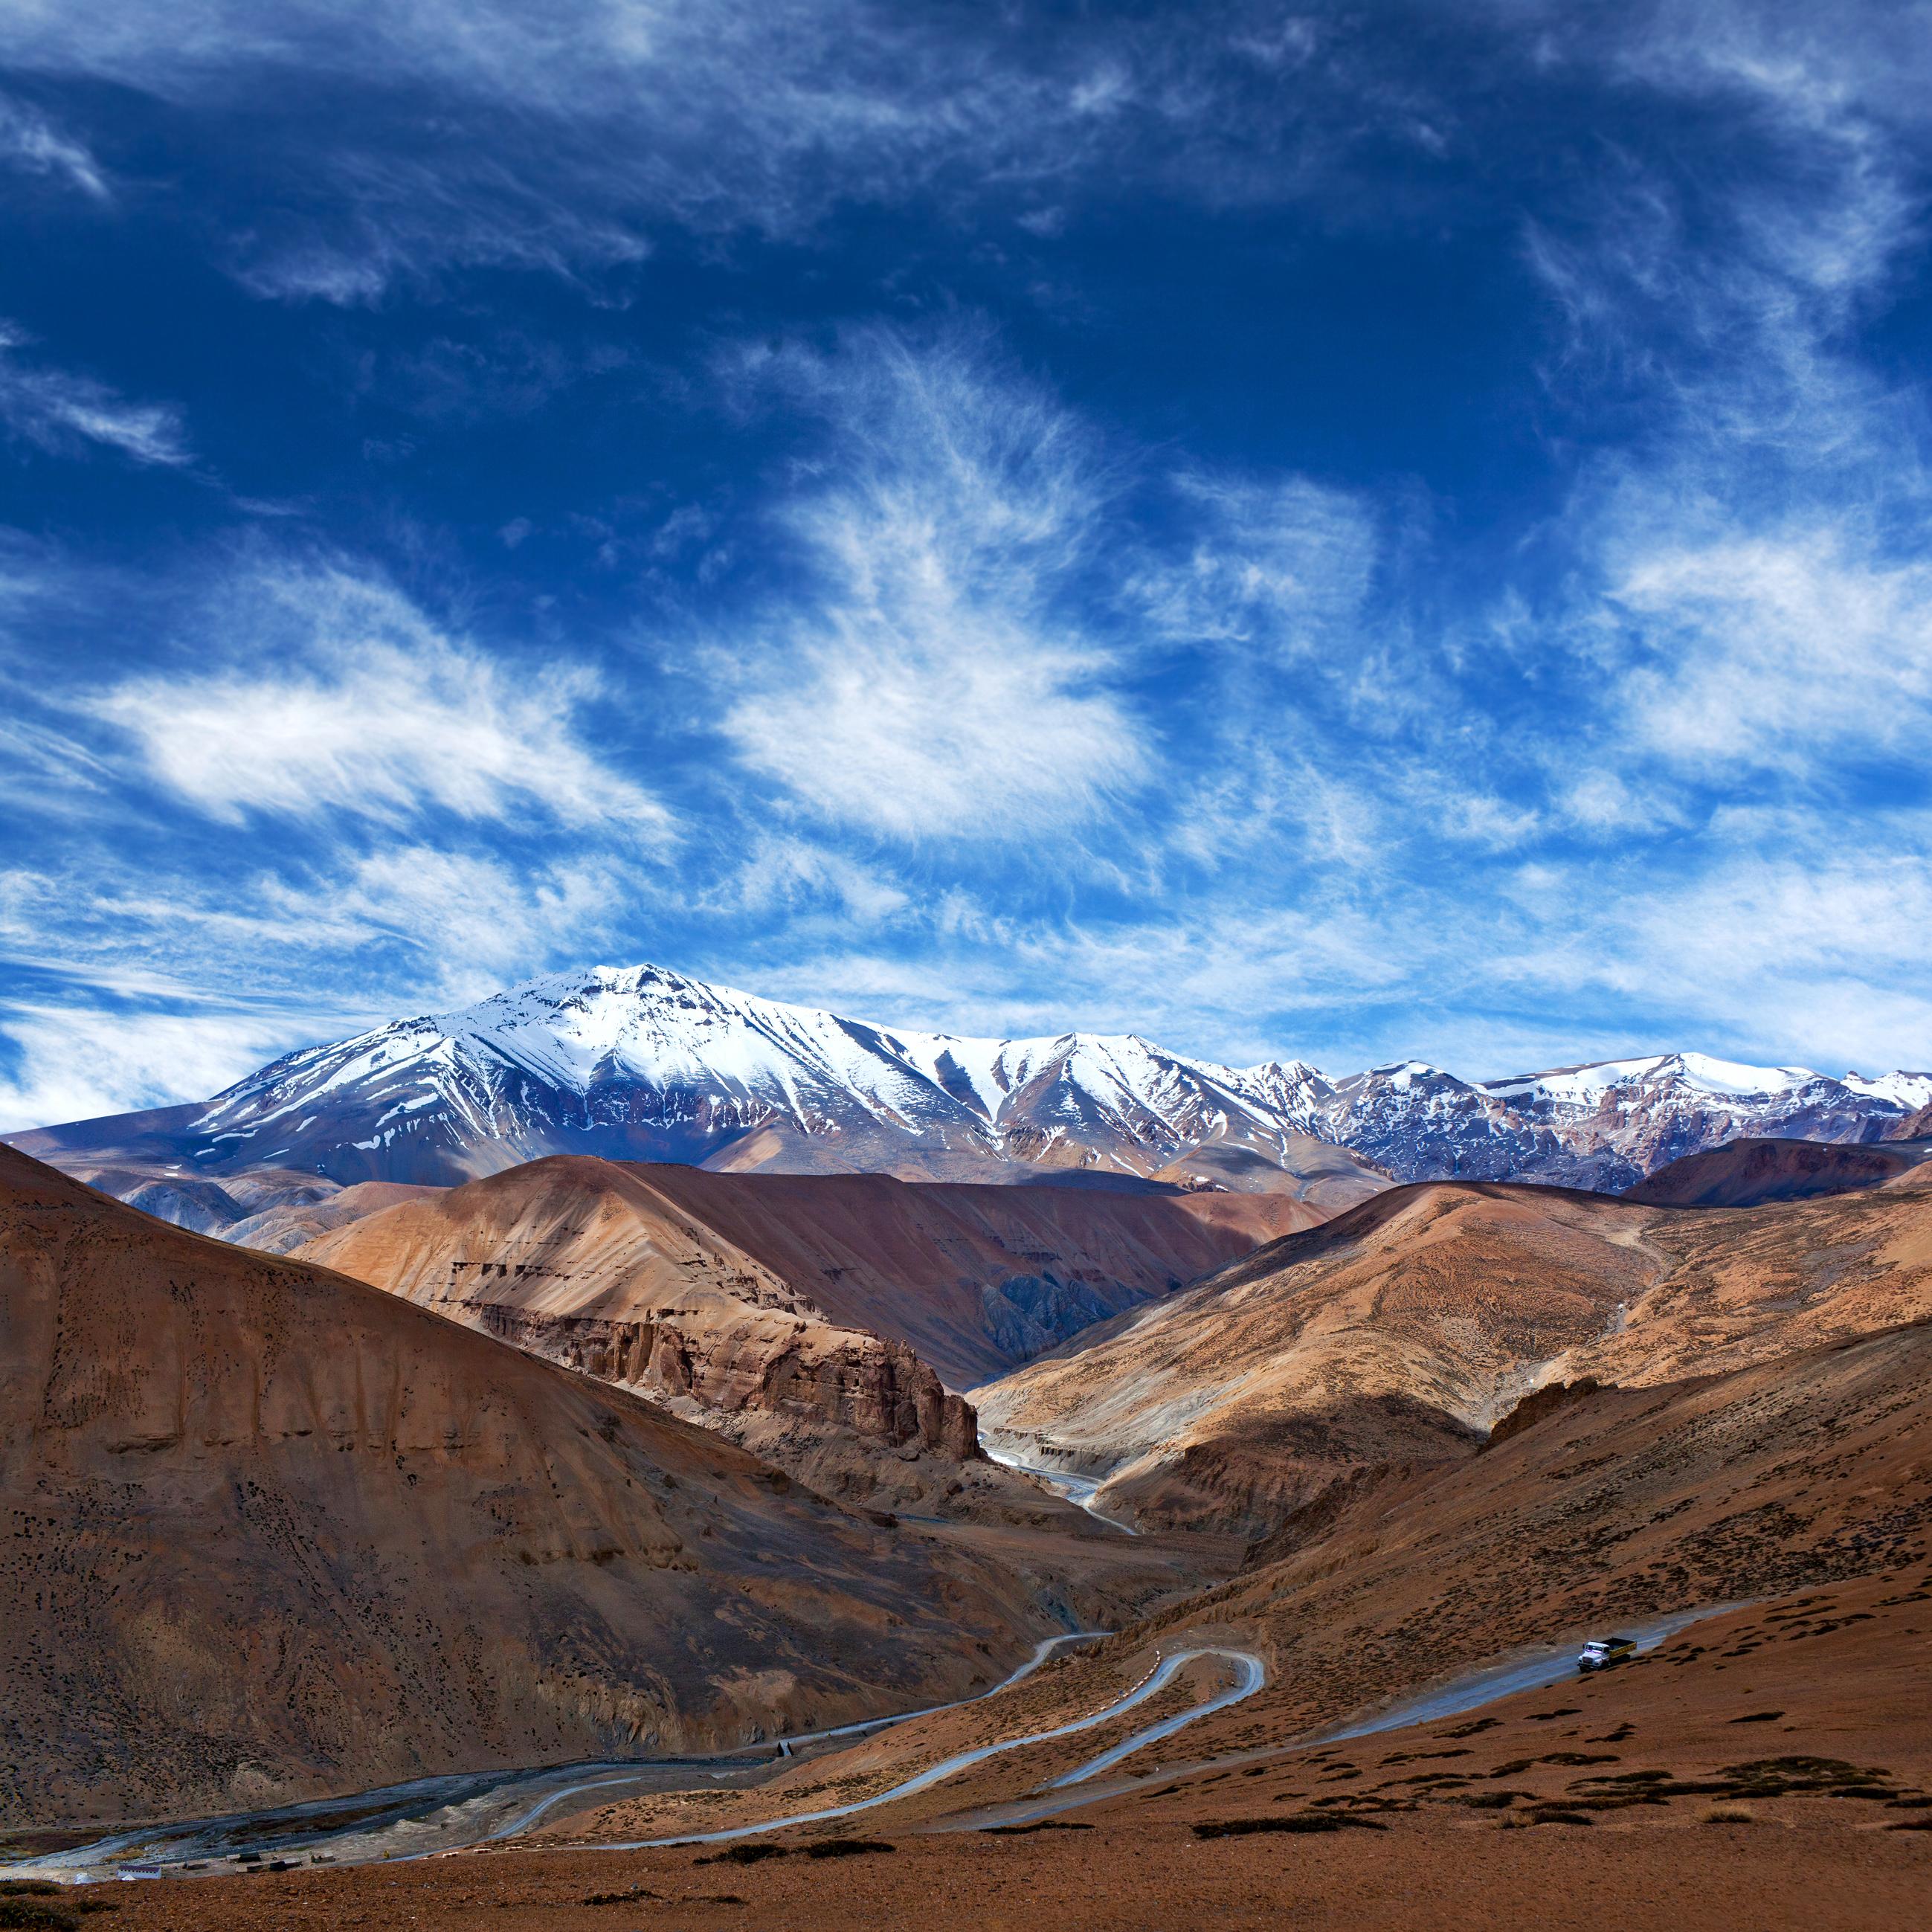 Himalayan mountain landscape along Manali - Leh National Highway in Ladakh, Jammu and Kashmir state,